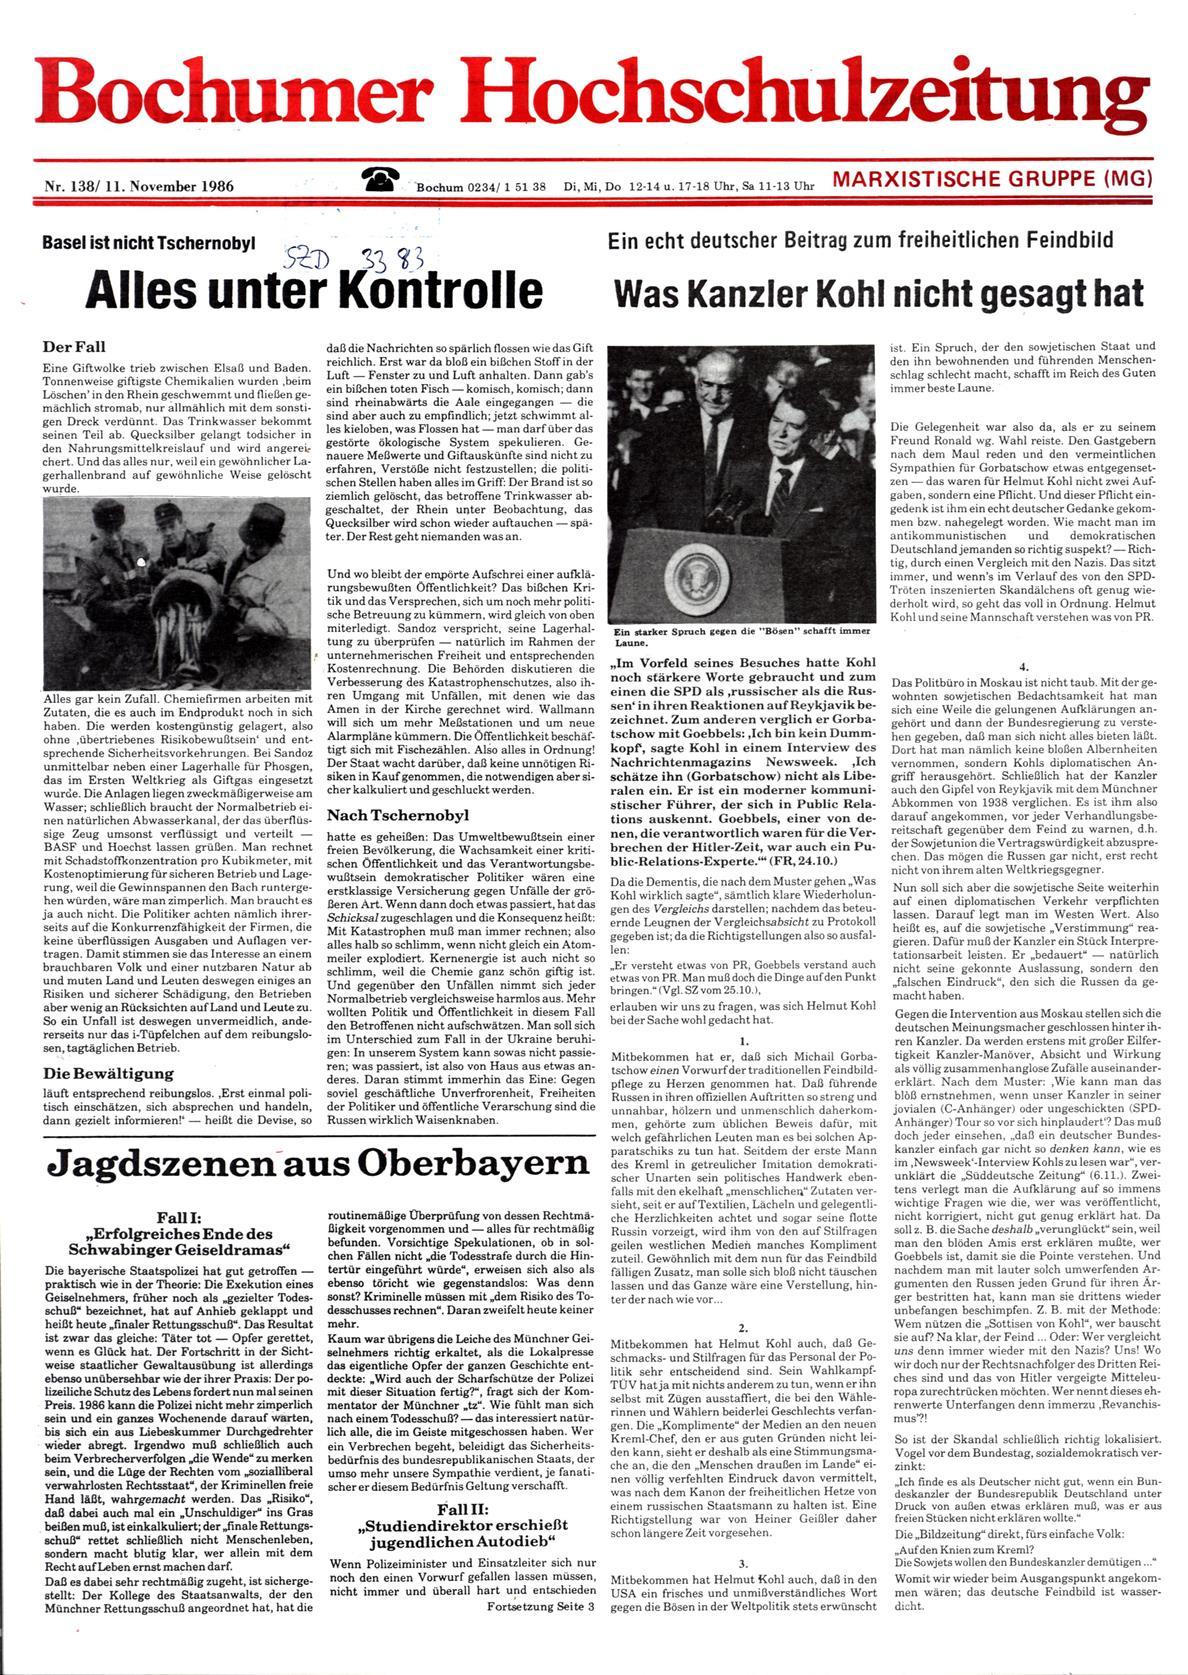 Bochum_BHZ_19861111_138_001